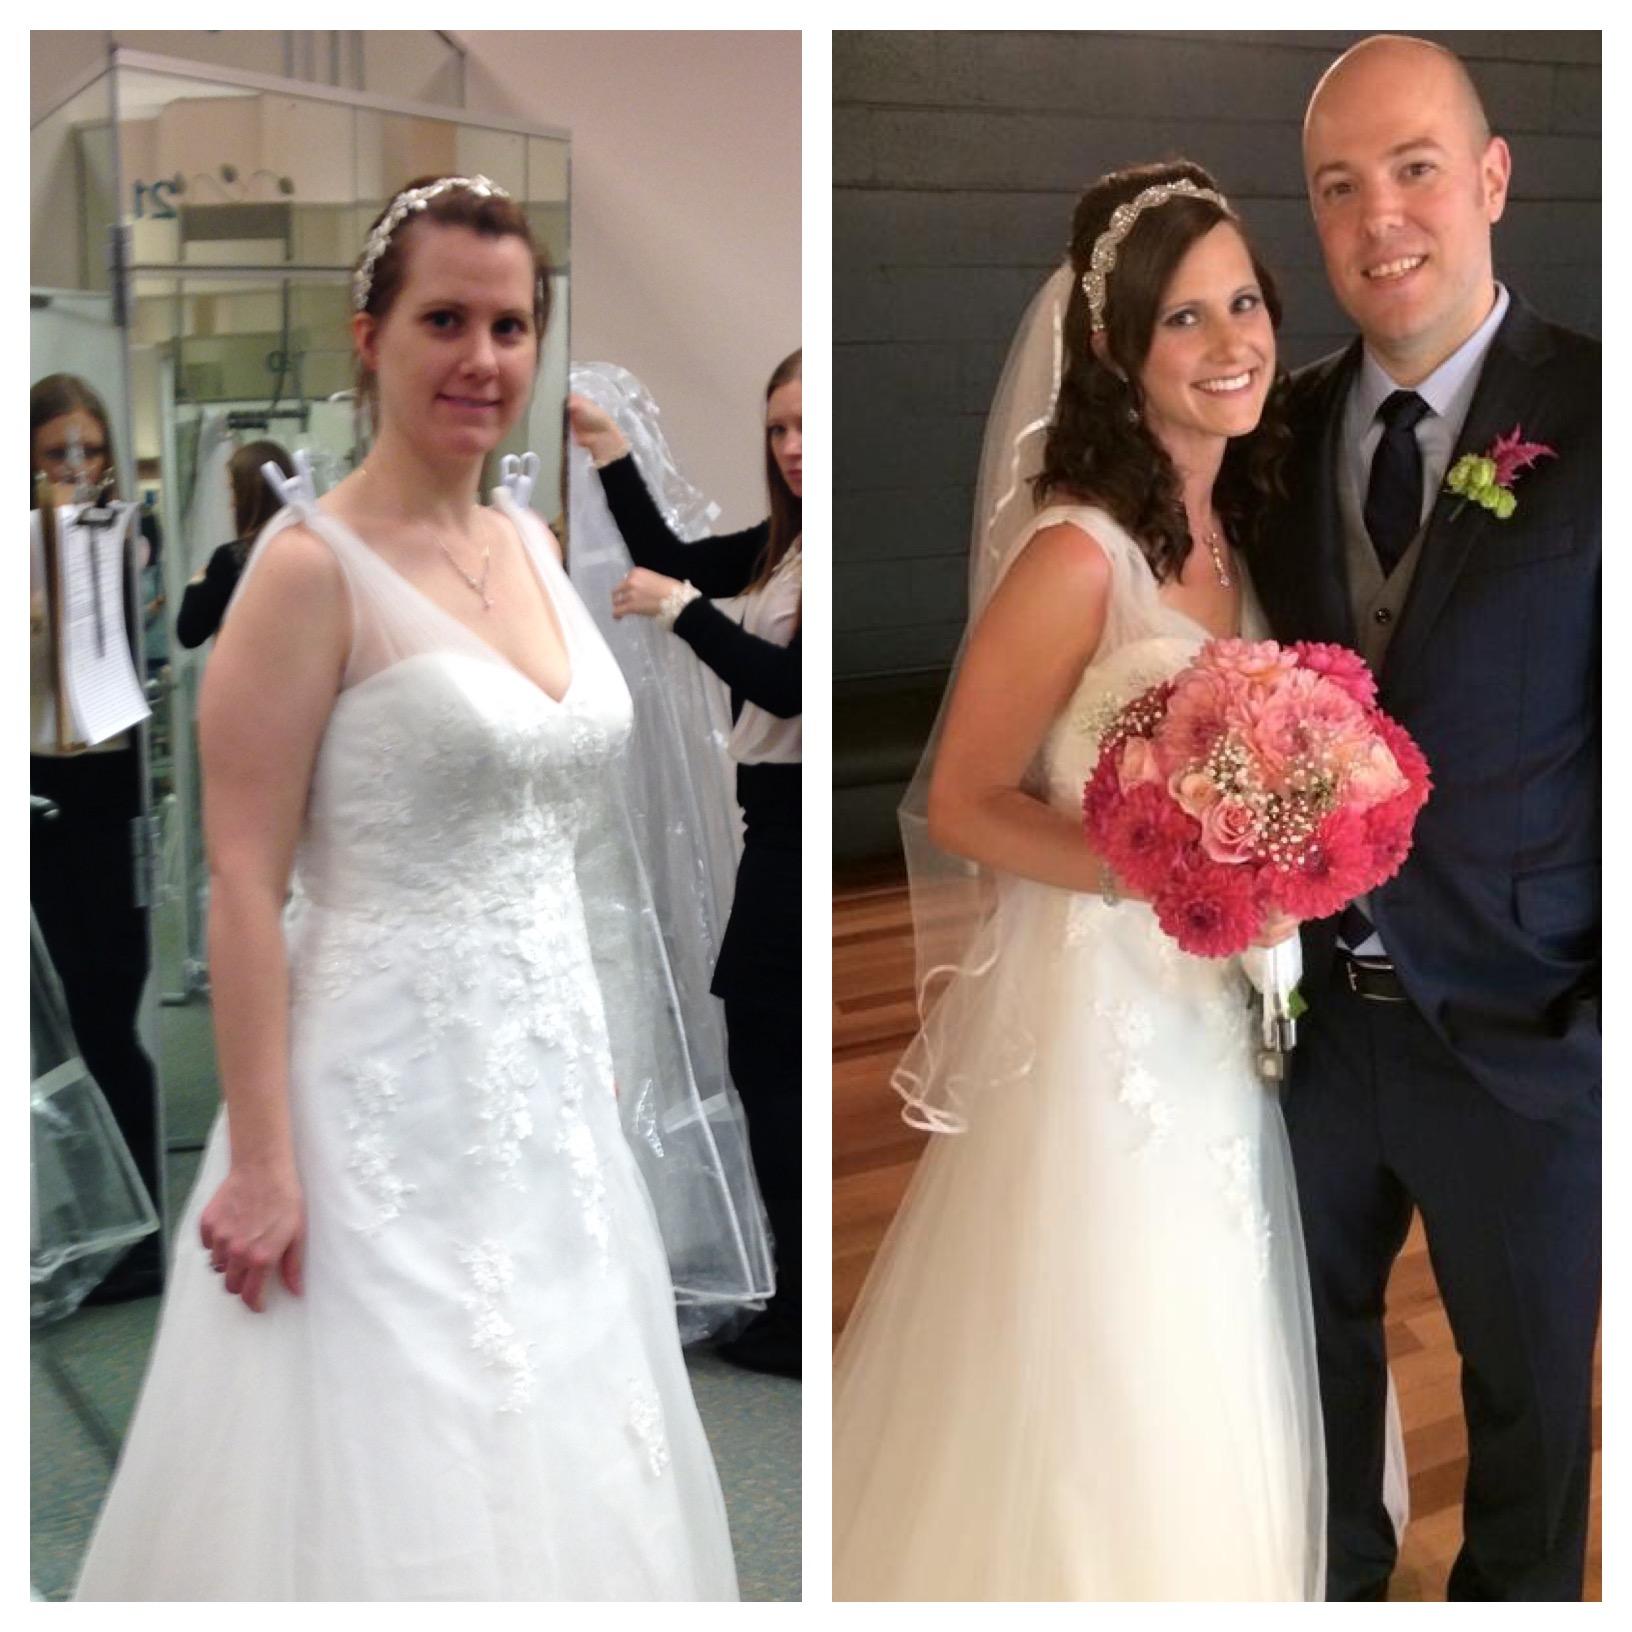 January 24, 2015: buying my wedding dress v. September 15, 2015: wearing my wedding dress